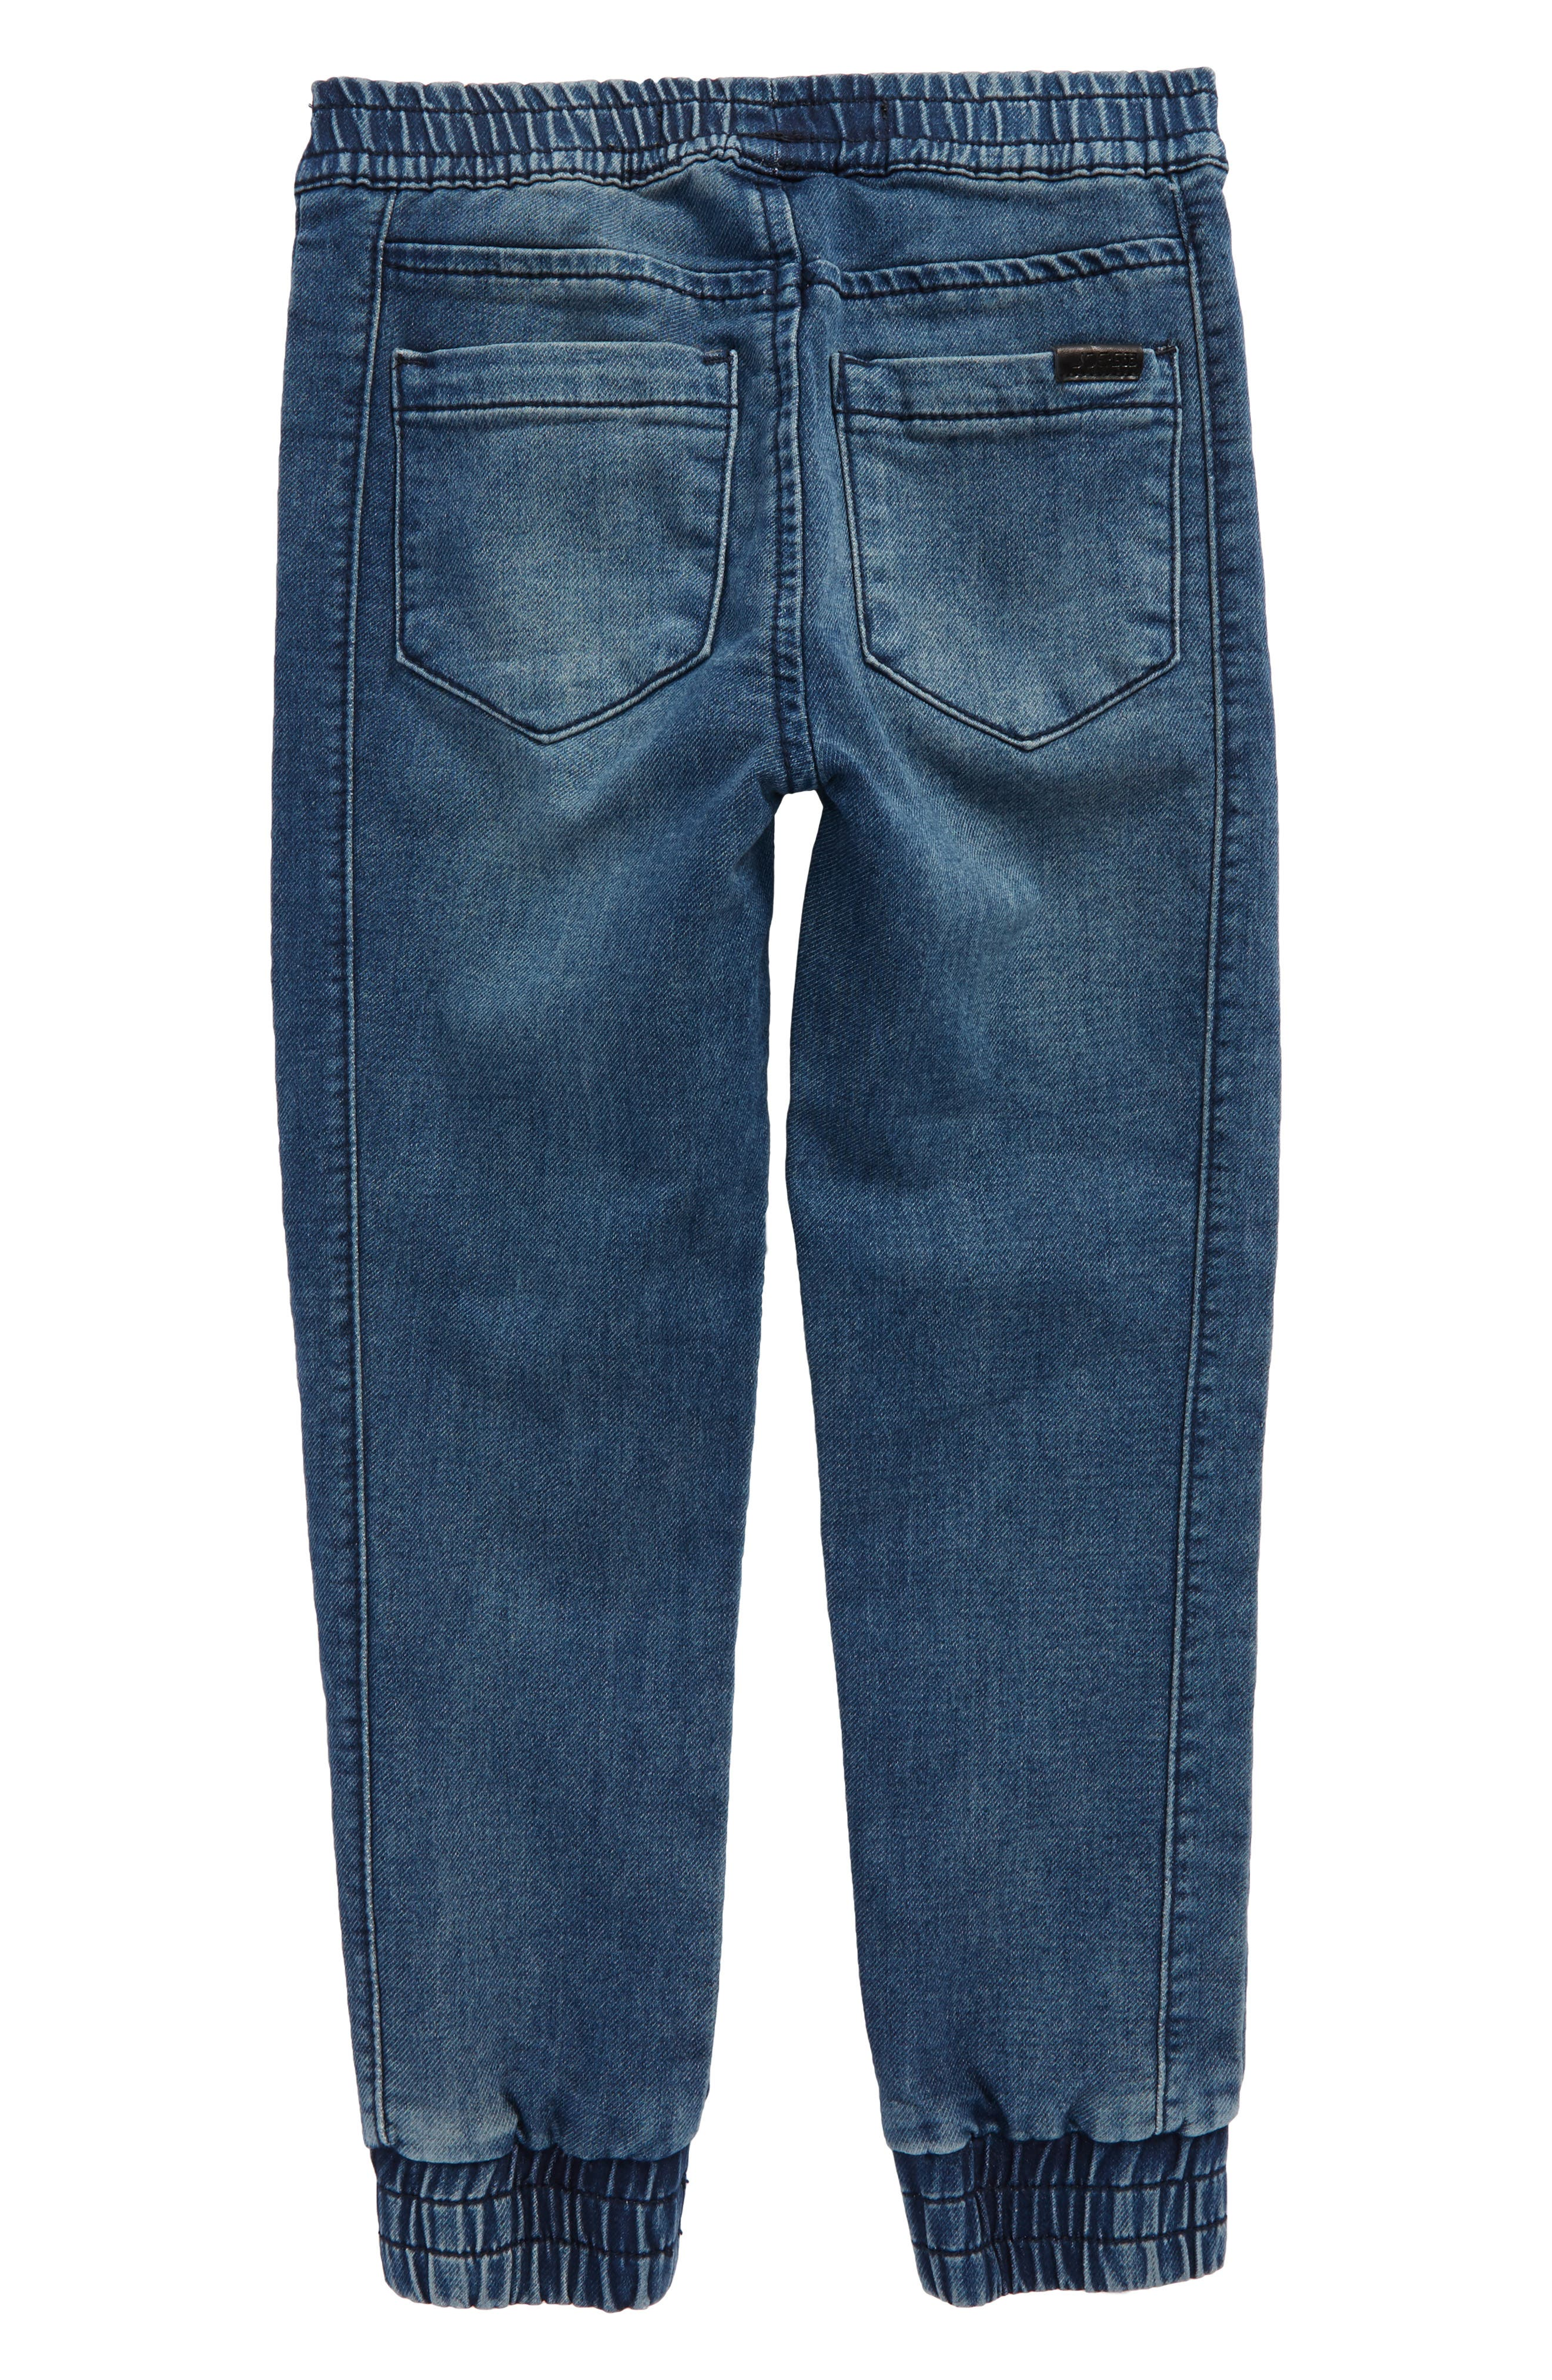 Slim Fit Denim Jogger Pants,                             Alternate thumbnail 2, color,                             490